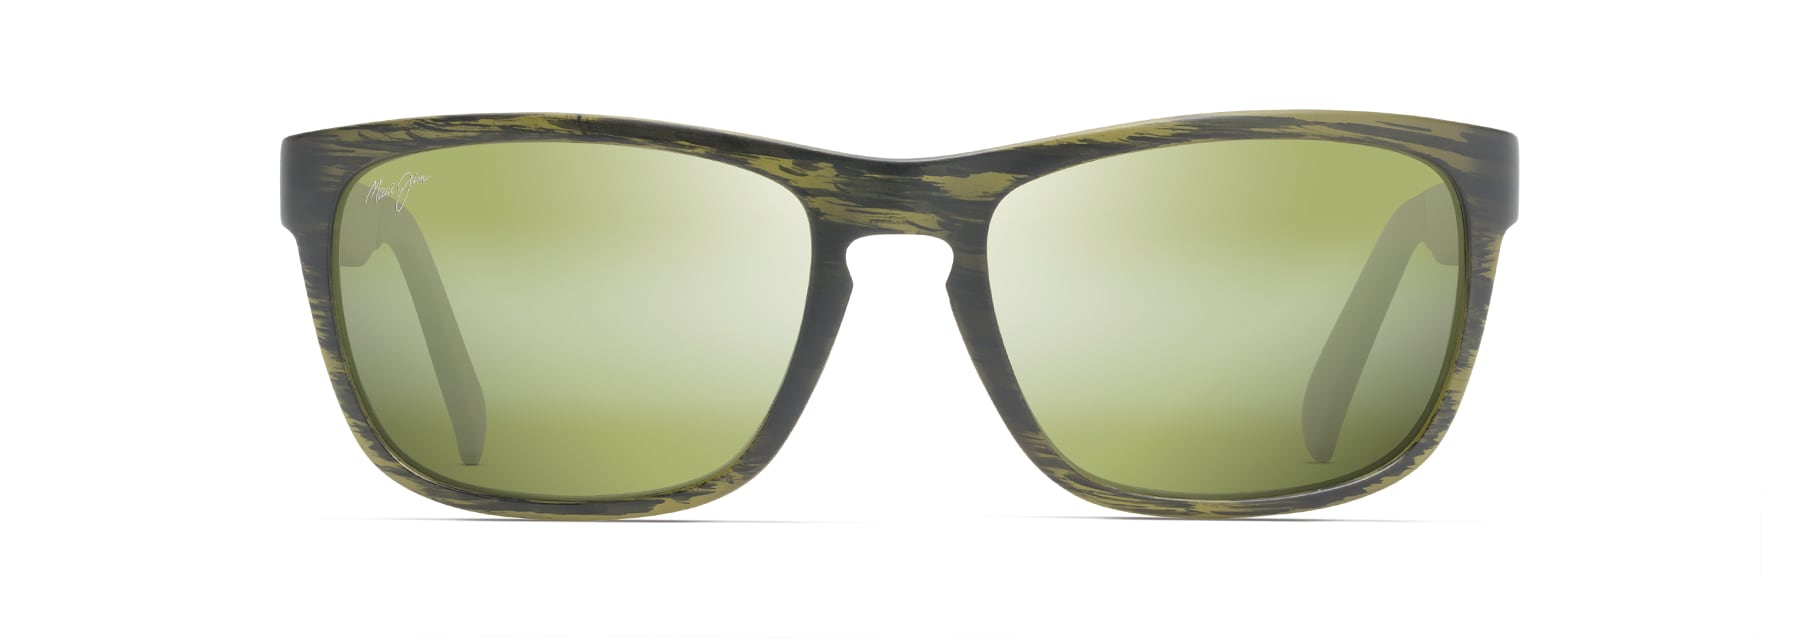 41d4c5409ebdb South Swell Polarized Sunglasses